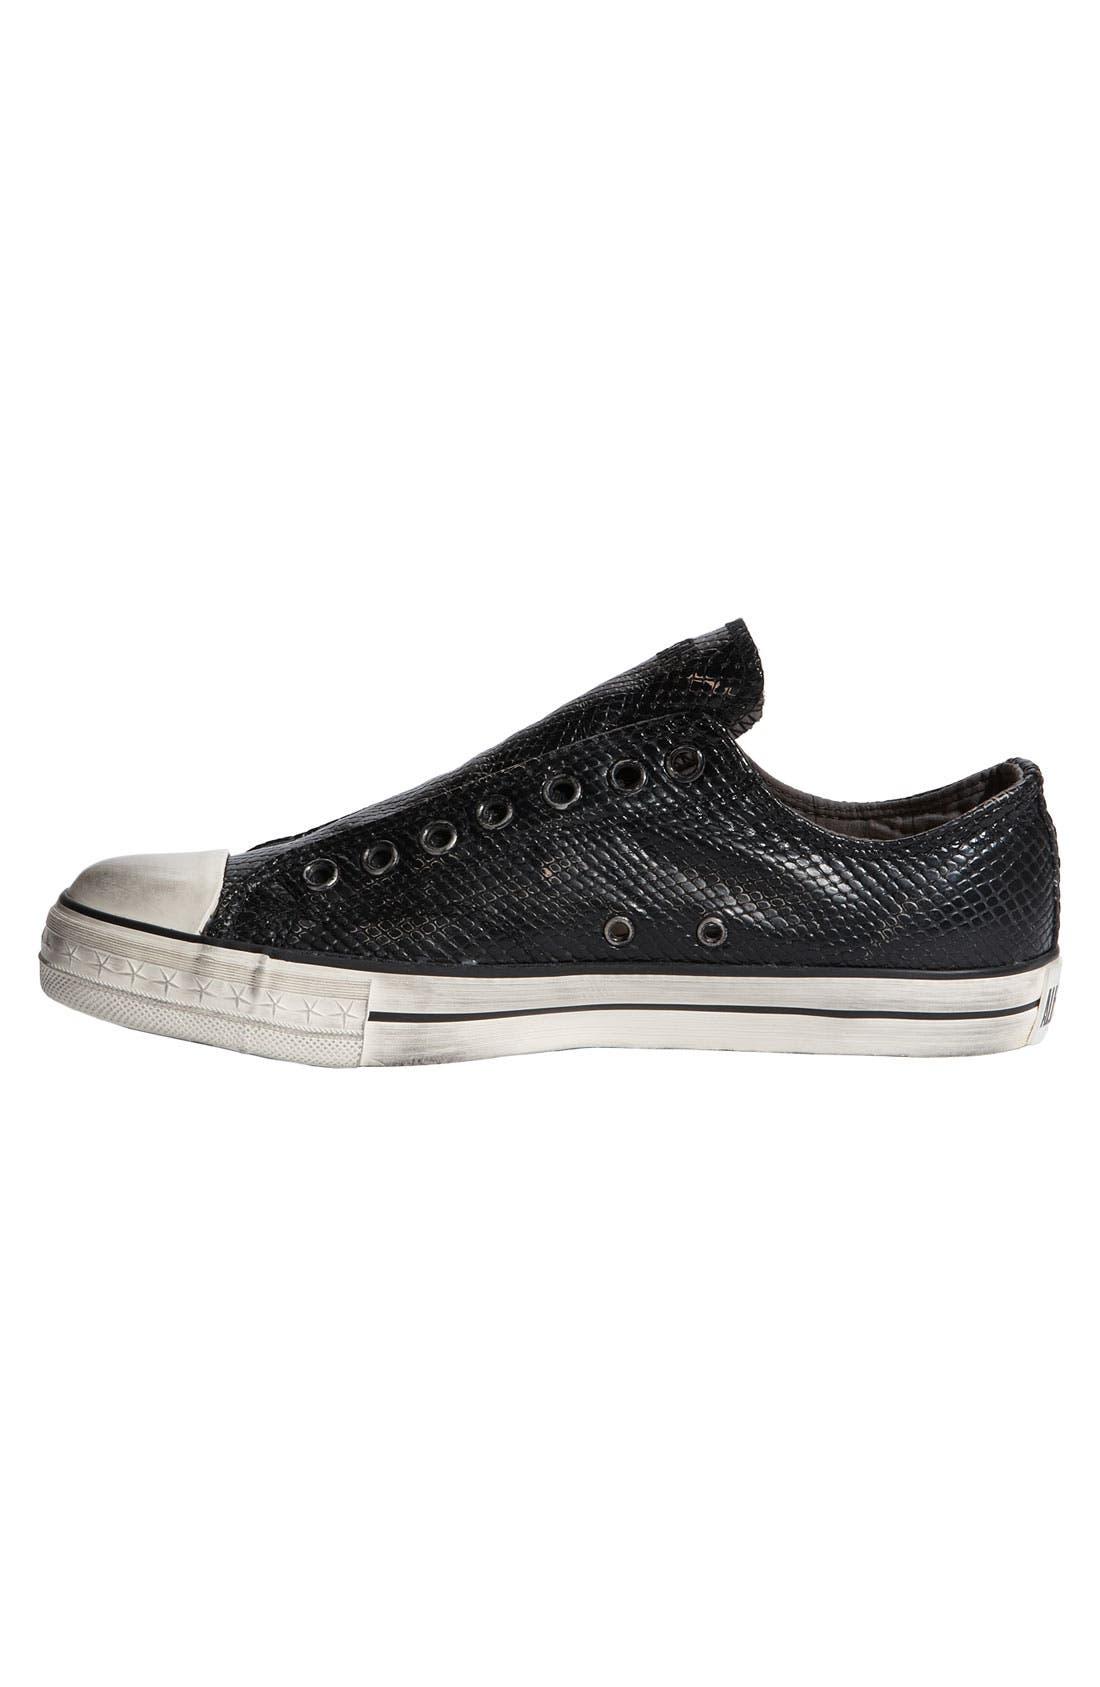 Alternate Image 3  - Converse Chuck Taylor® Textured Leather Slip-On